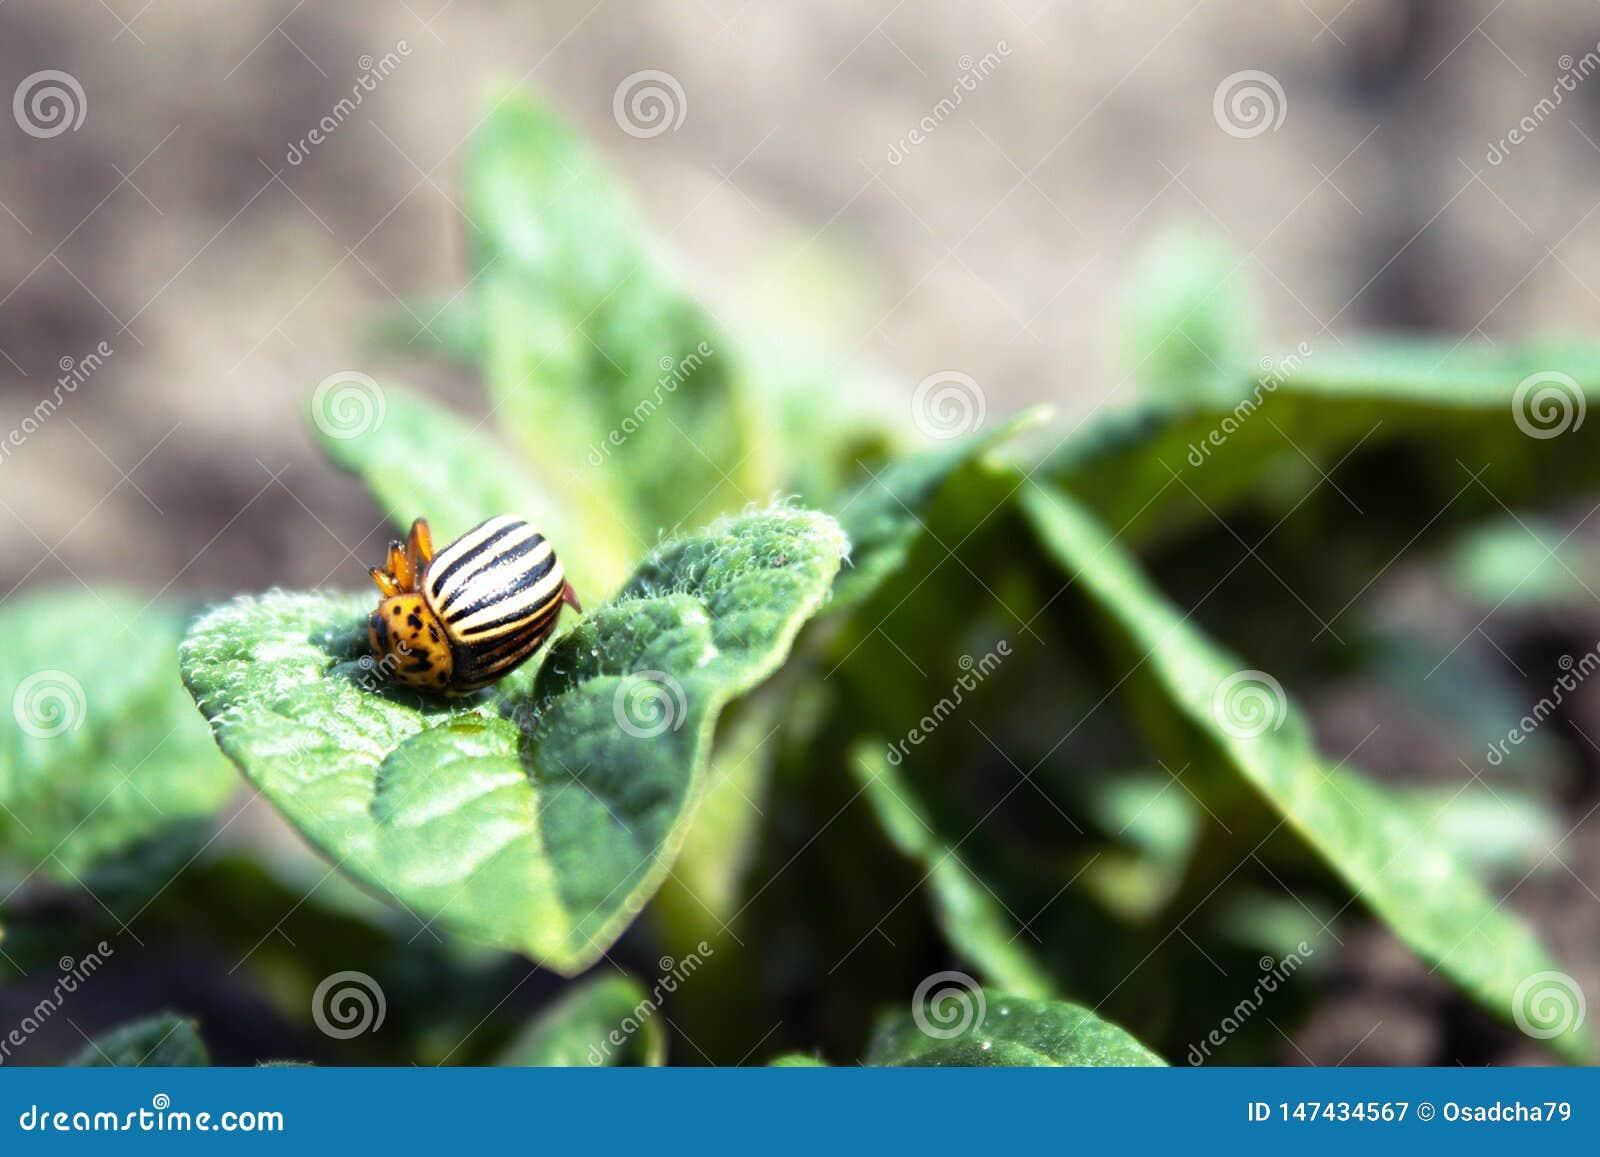 Close-up of the Colorado potato beetle on young leaves of potato